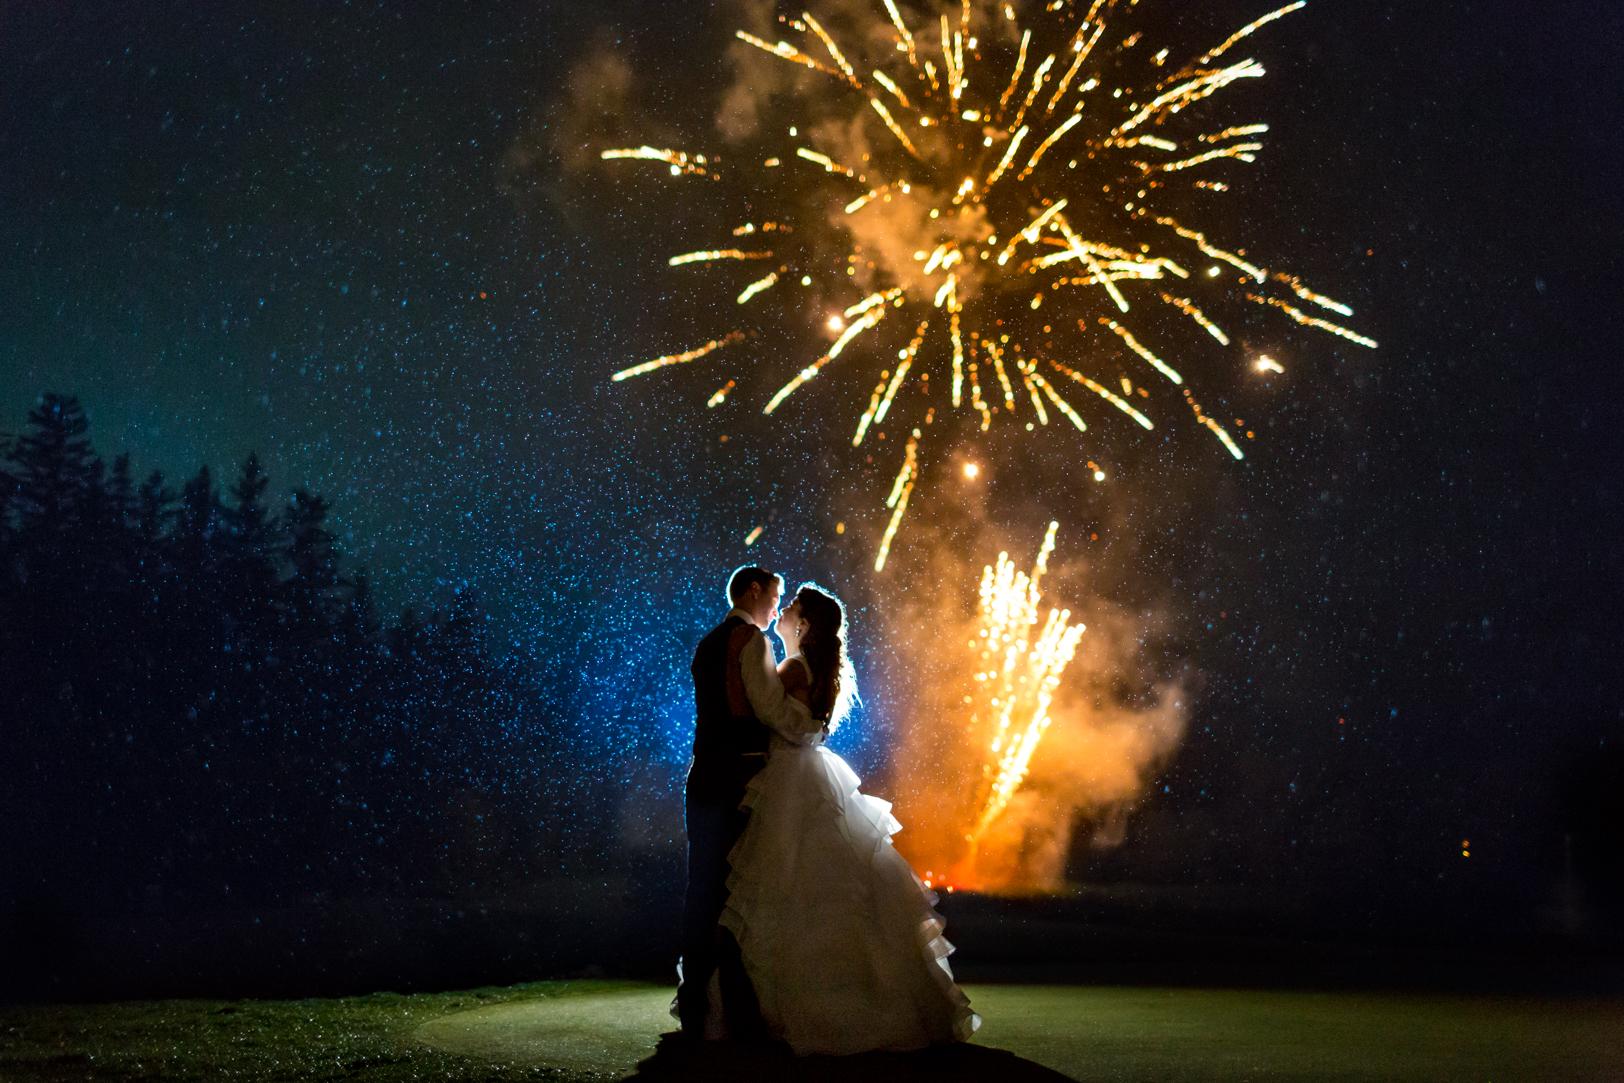 Night Wedding Photos with Fireworks